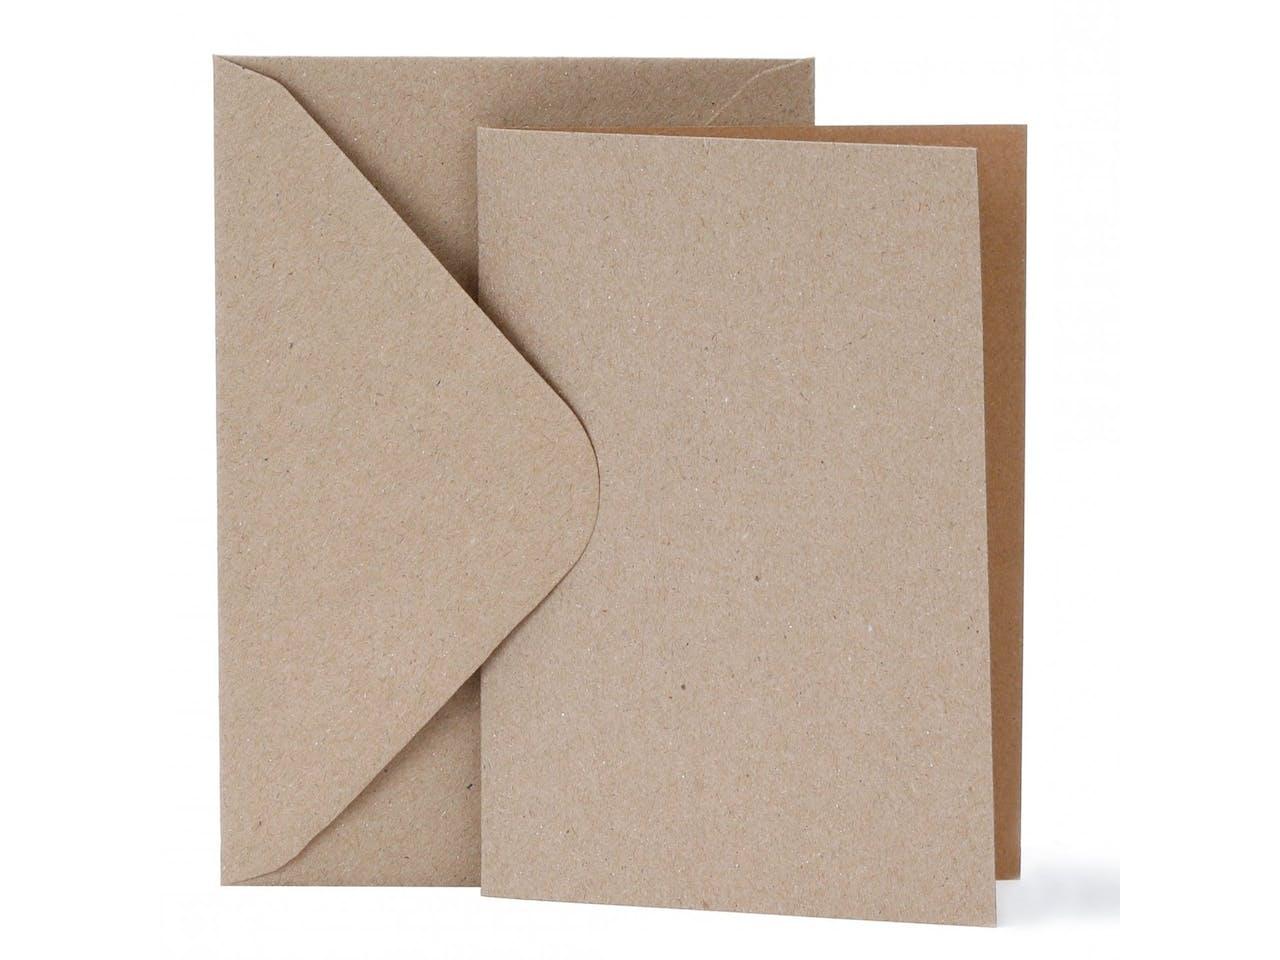 Recyclingpapier Blankokarten-Set, je 10 Karten 105x150 mm & Kuverts 115x165 mm,natur